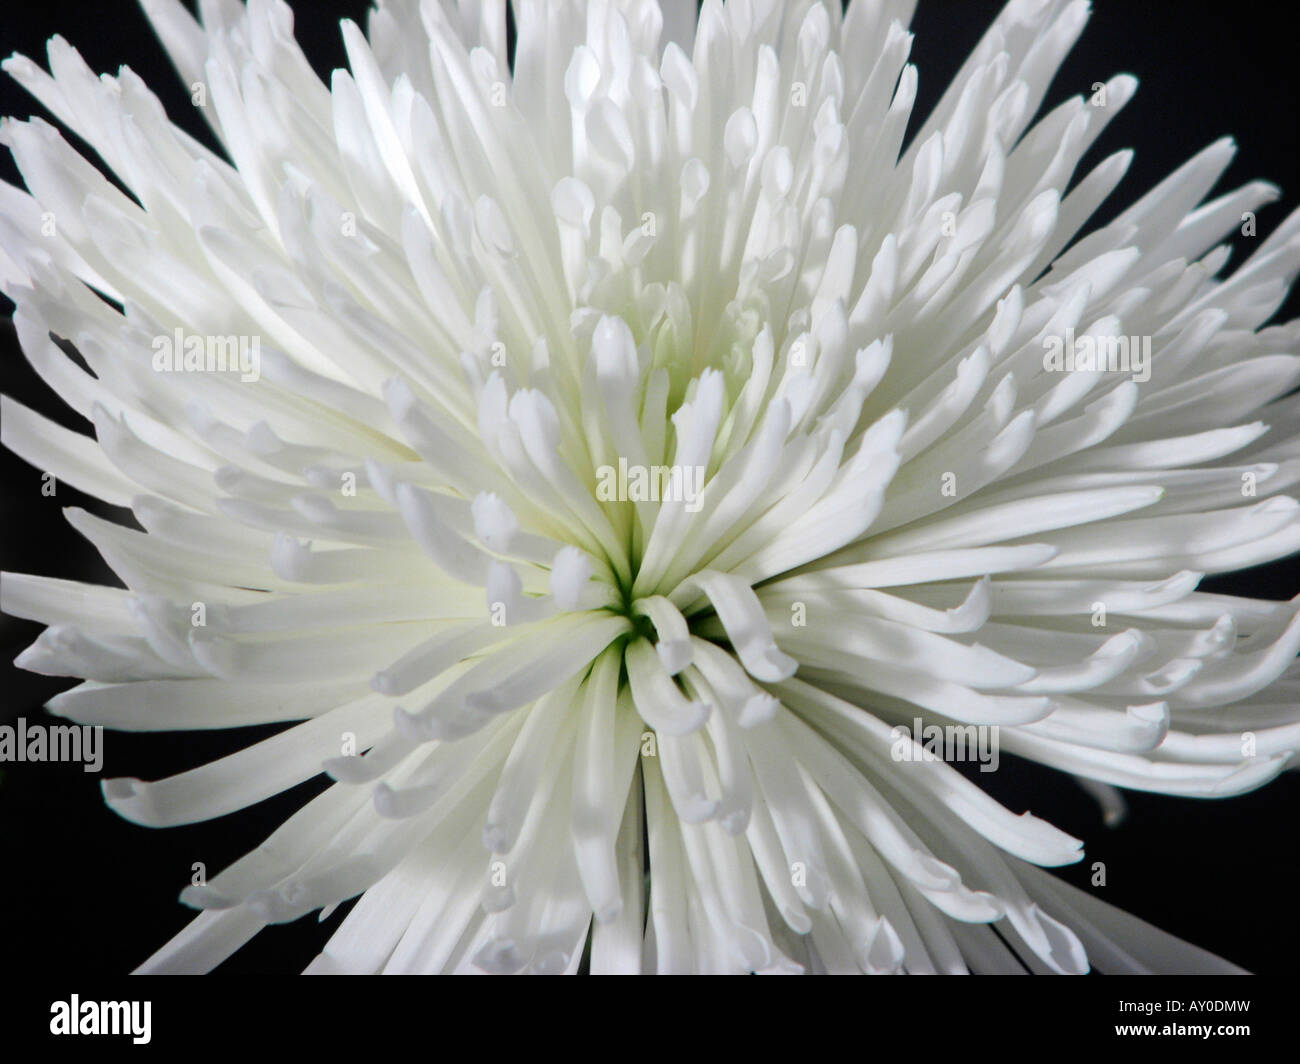 Chrysanthemum Anastasia White Stock Photos Chrysanthemum Anastasia